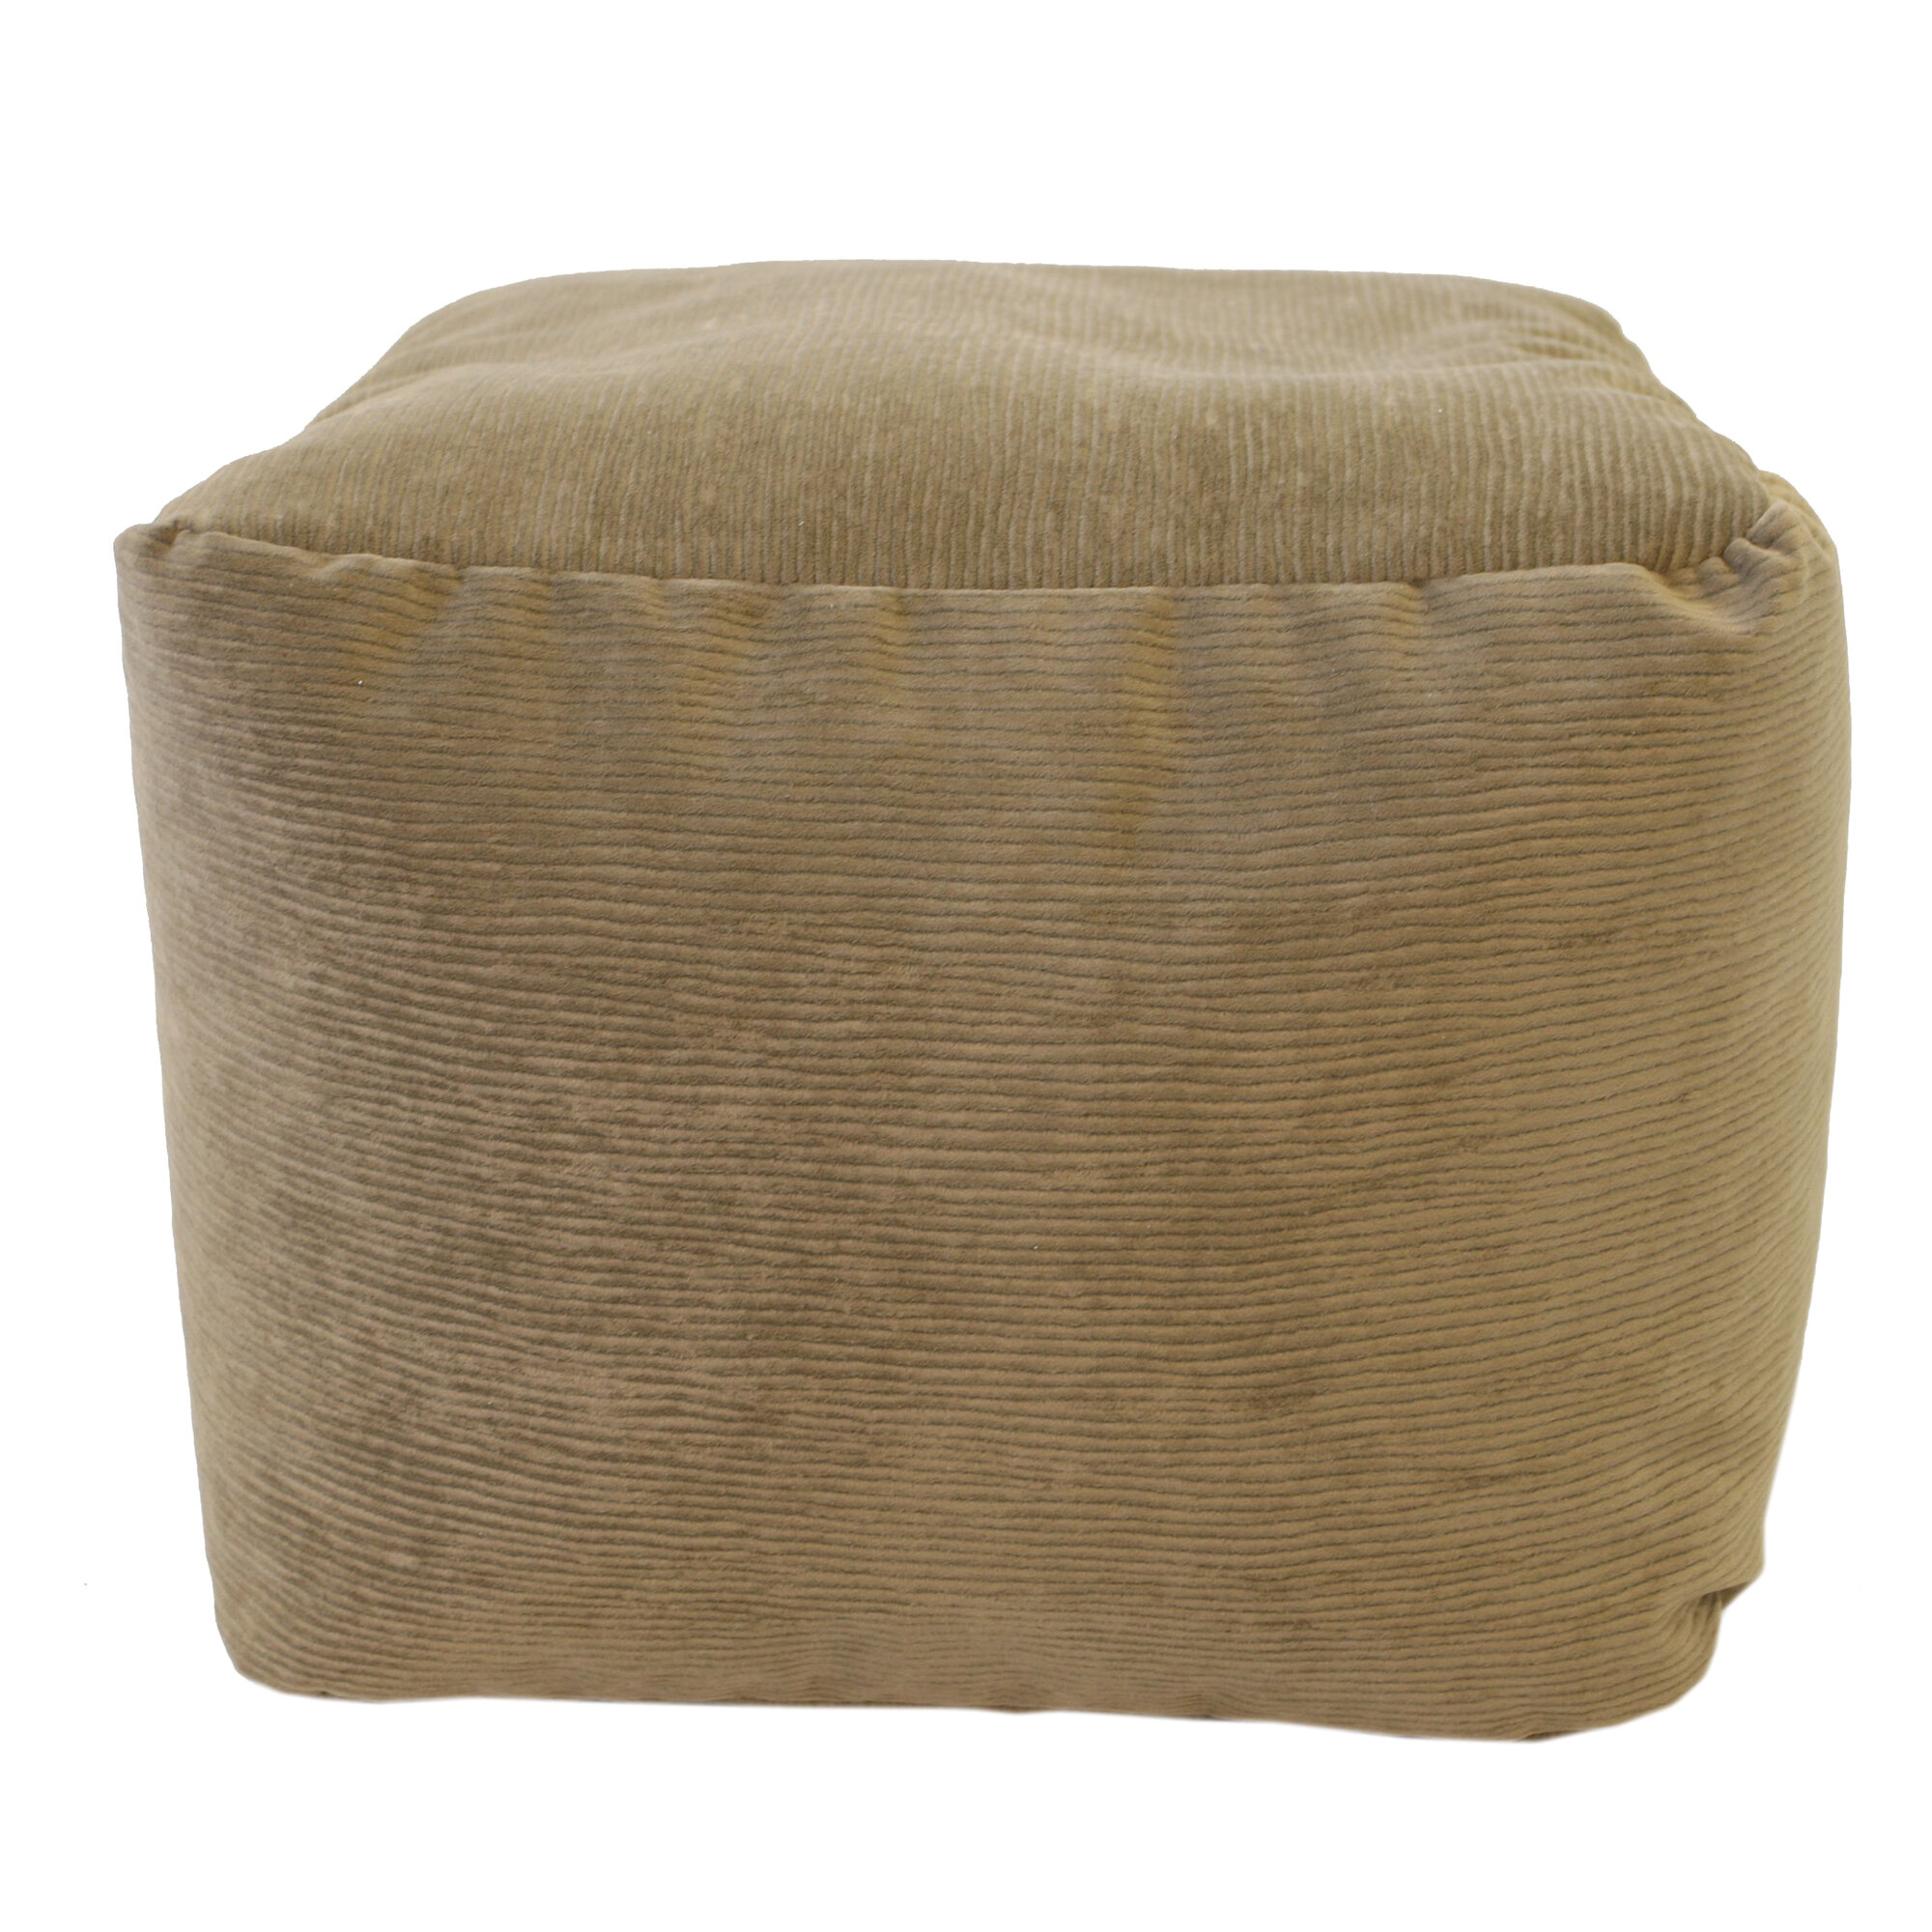 Gold Medal Bean Bags Medium Corduroy Ottoman Ebay